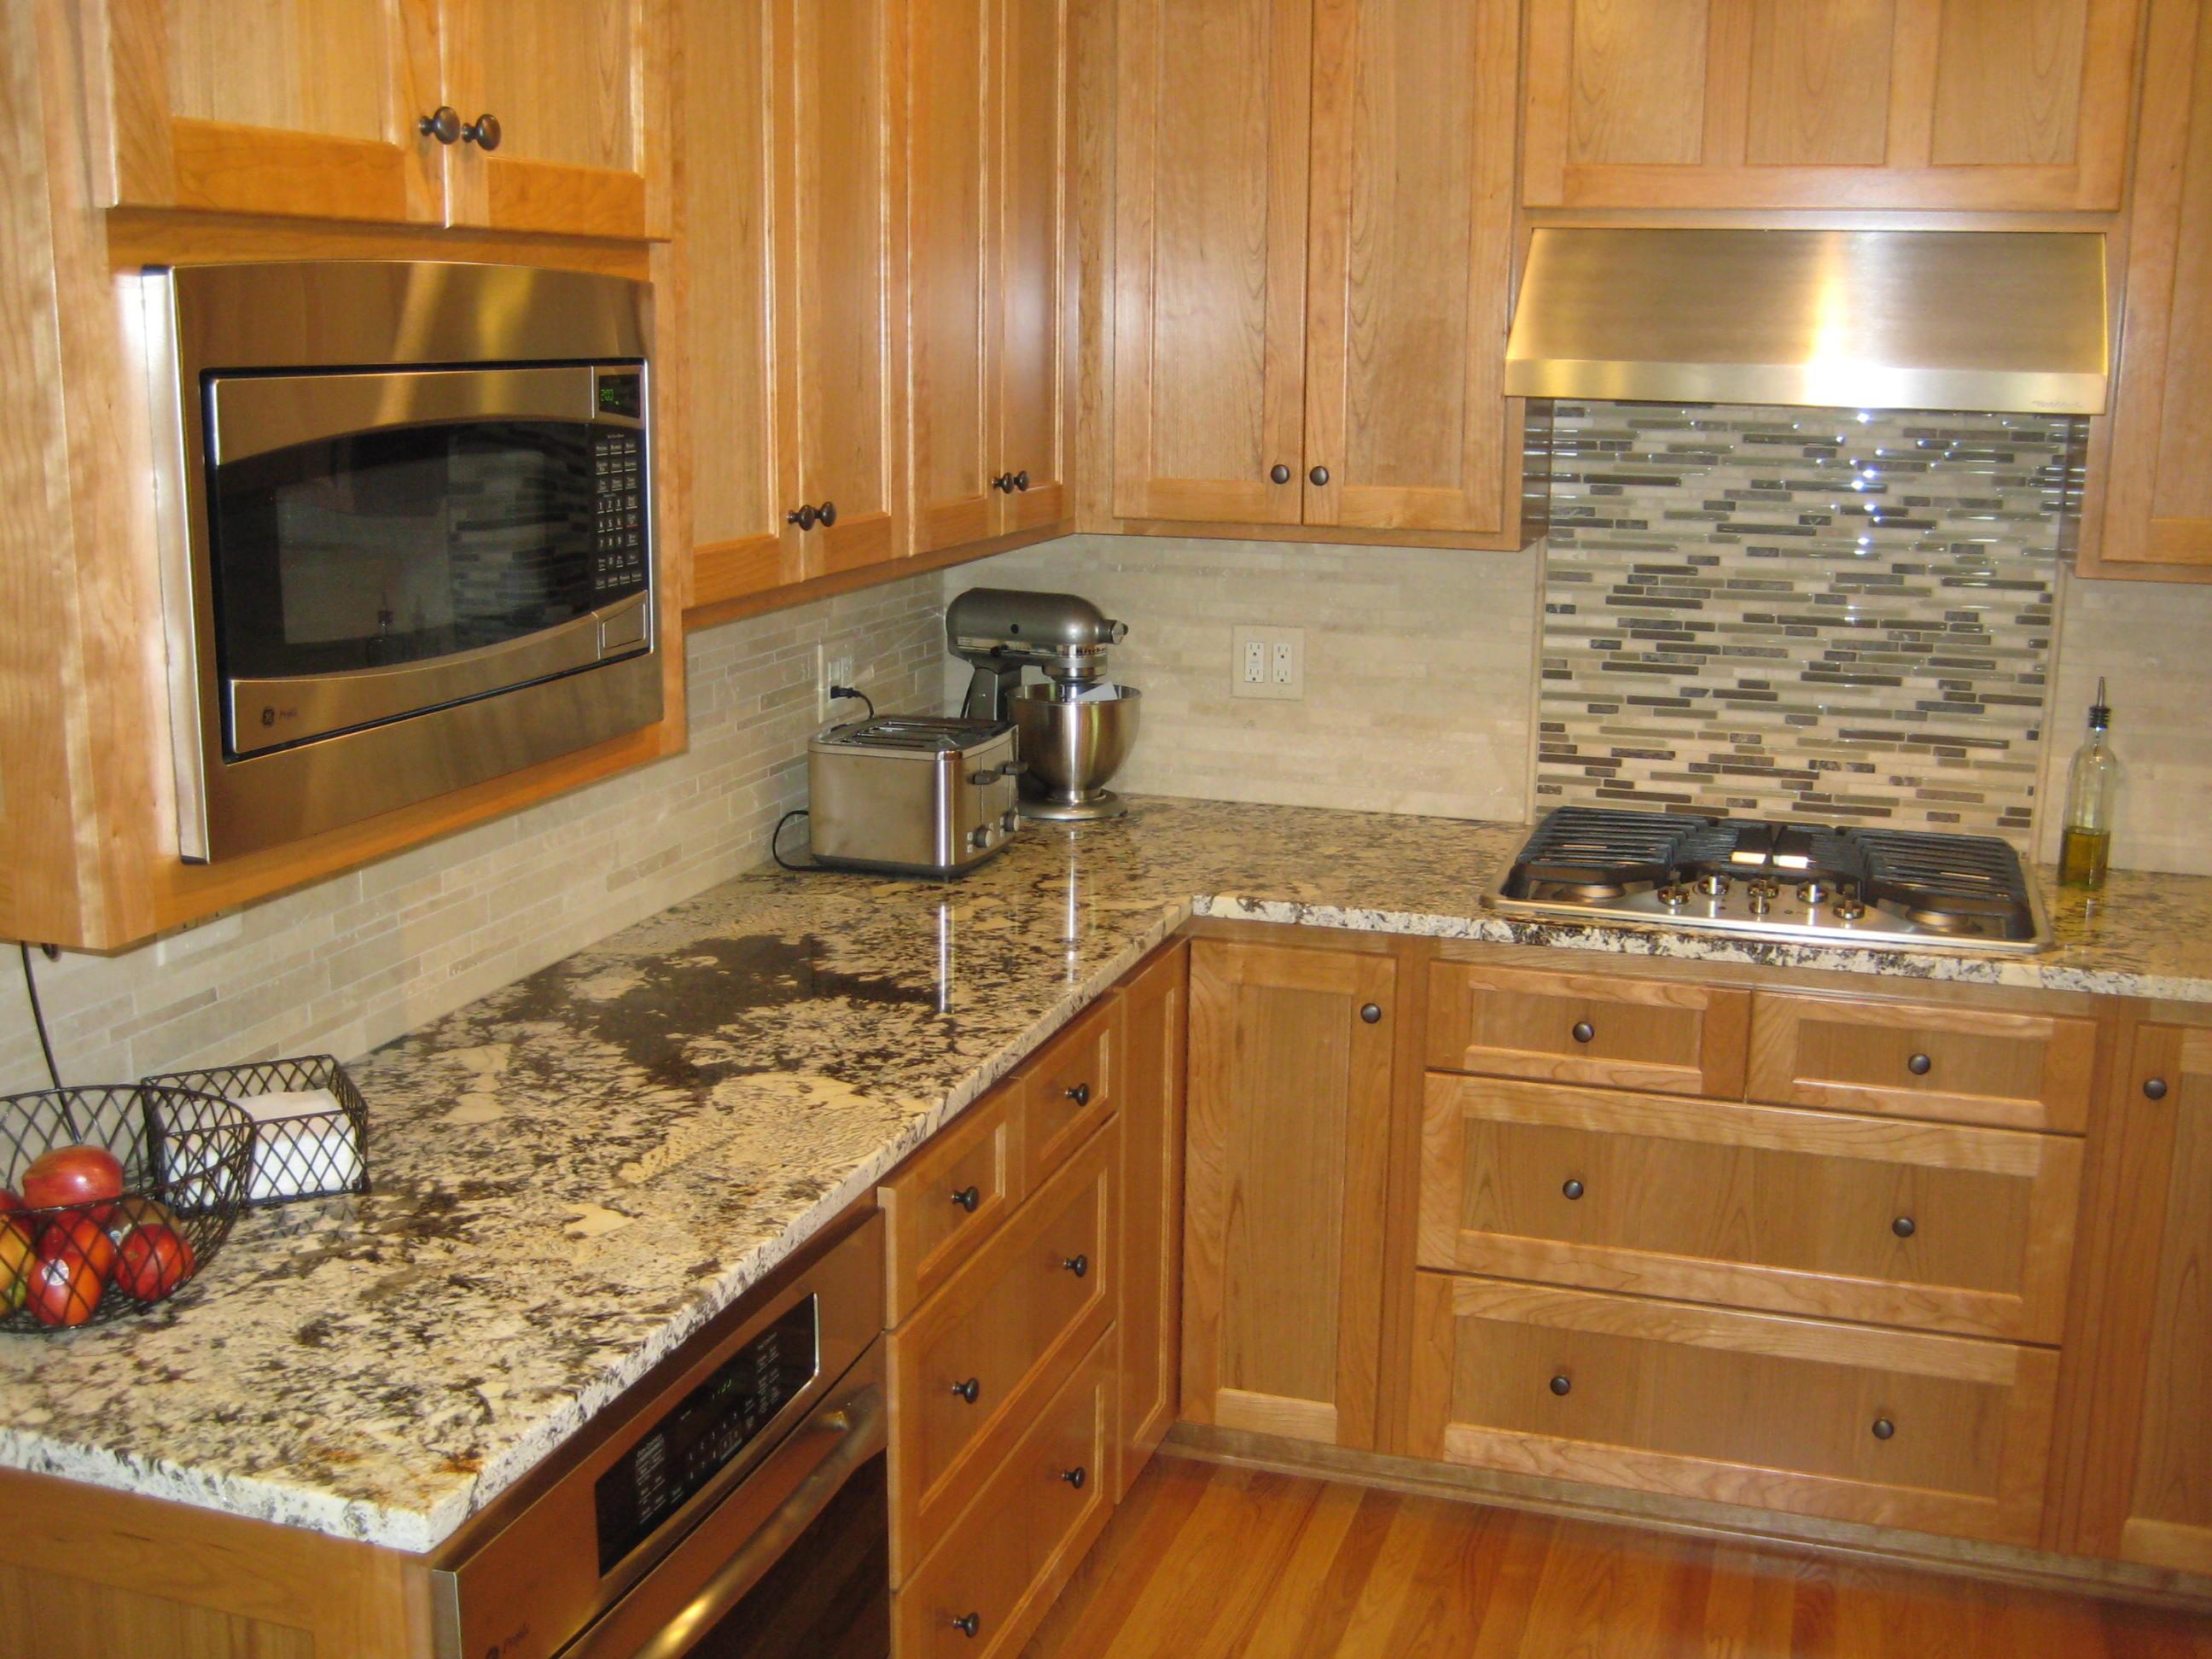 kitchen cabinet tile ideas photo - 7